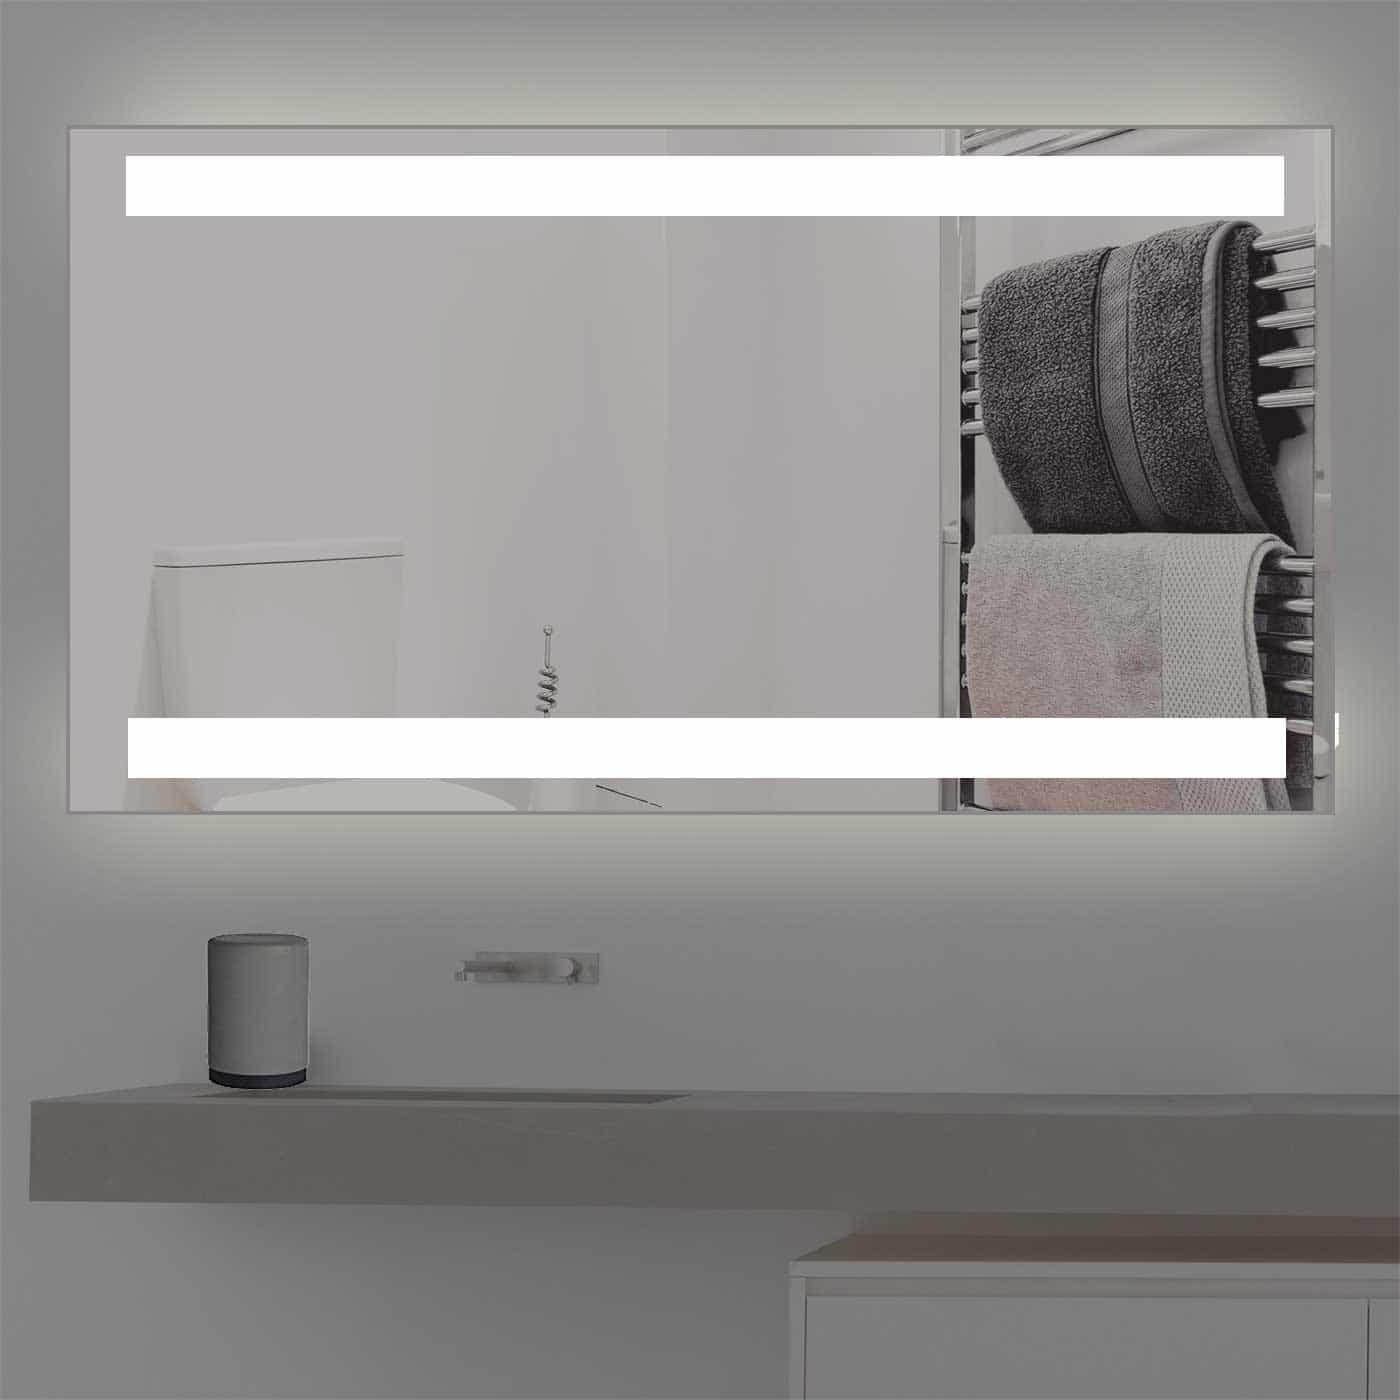 wandspiegel mit led beleuchtung k 201 kostenloser versand. Black Bedroom Furniture Sets. Home Design Ideas